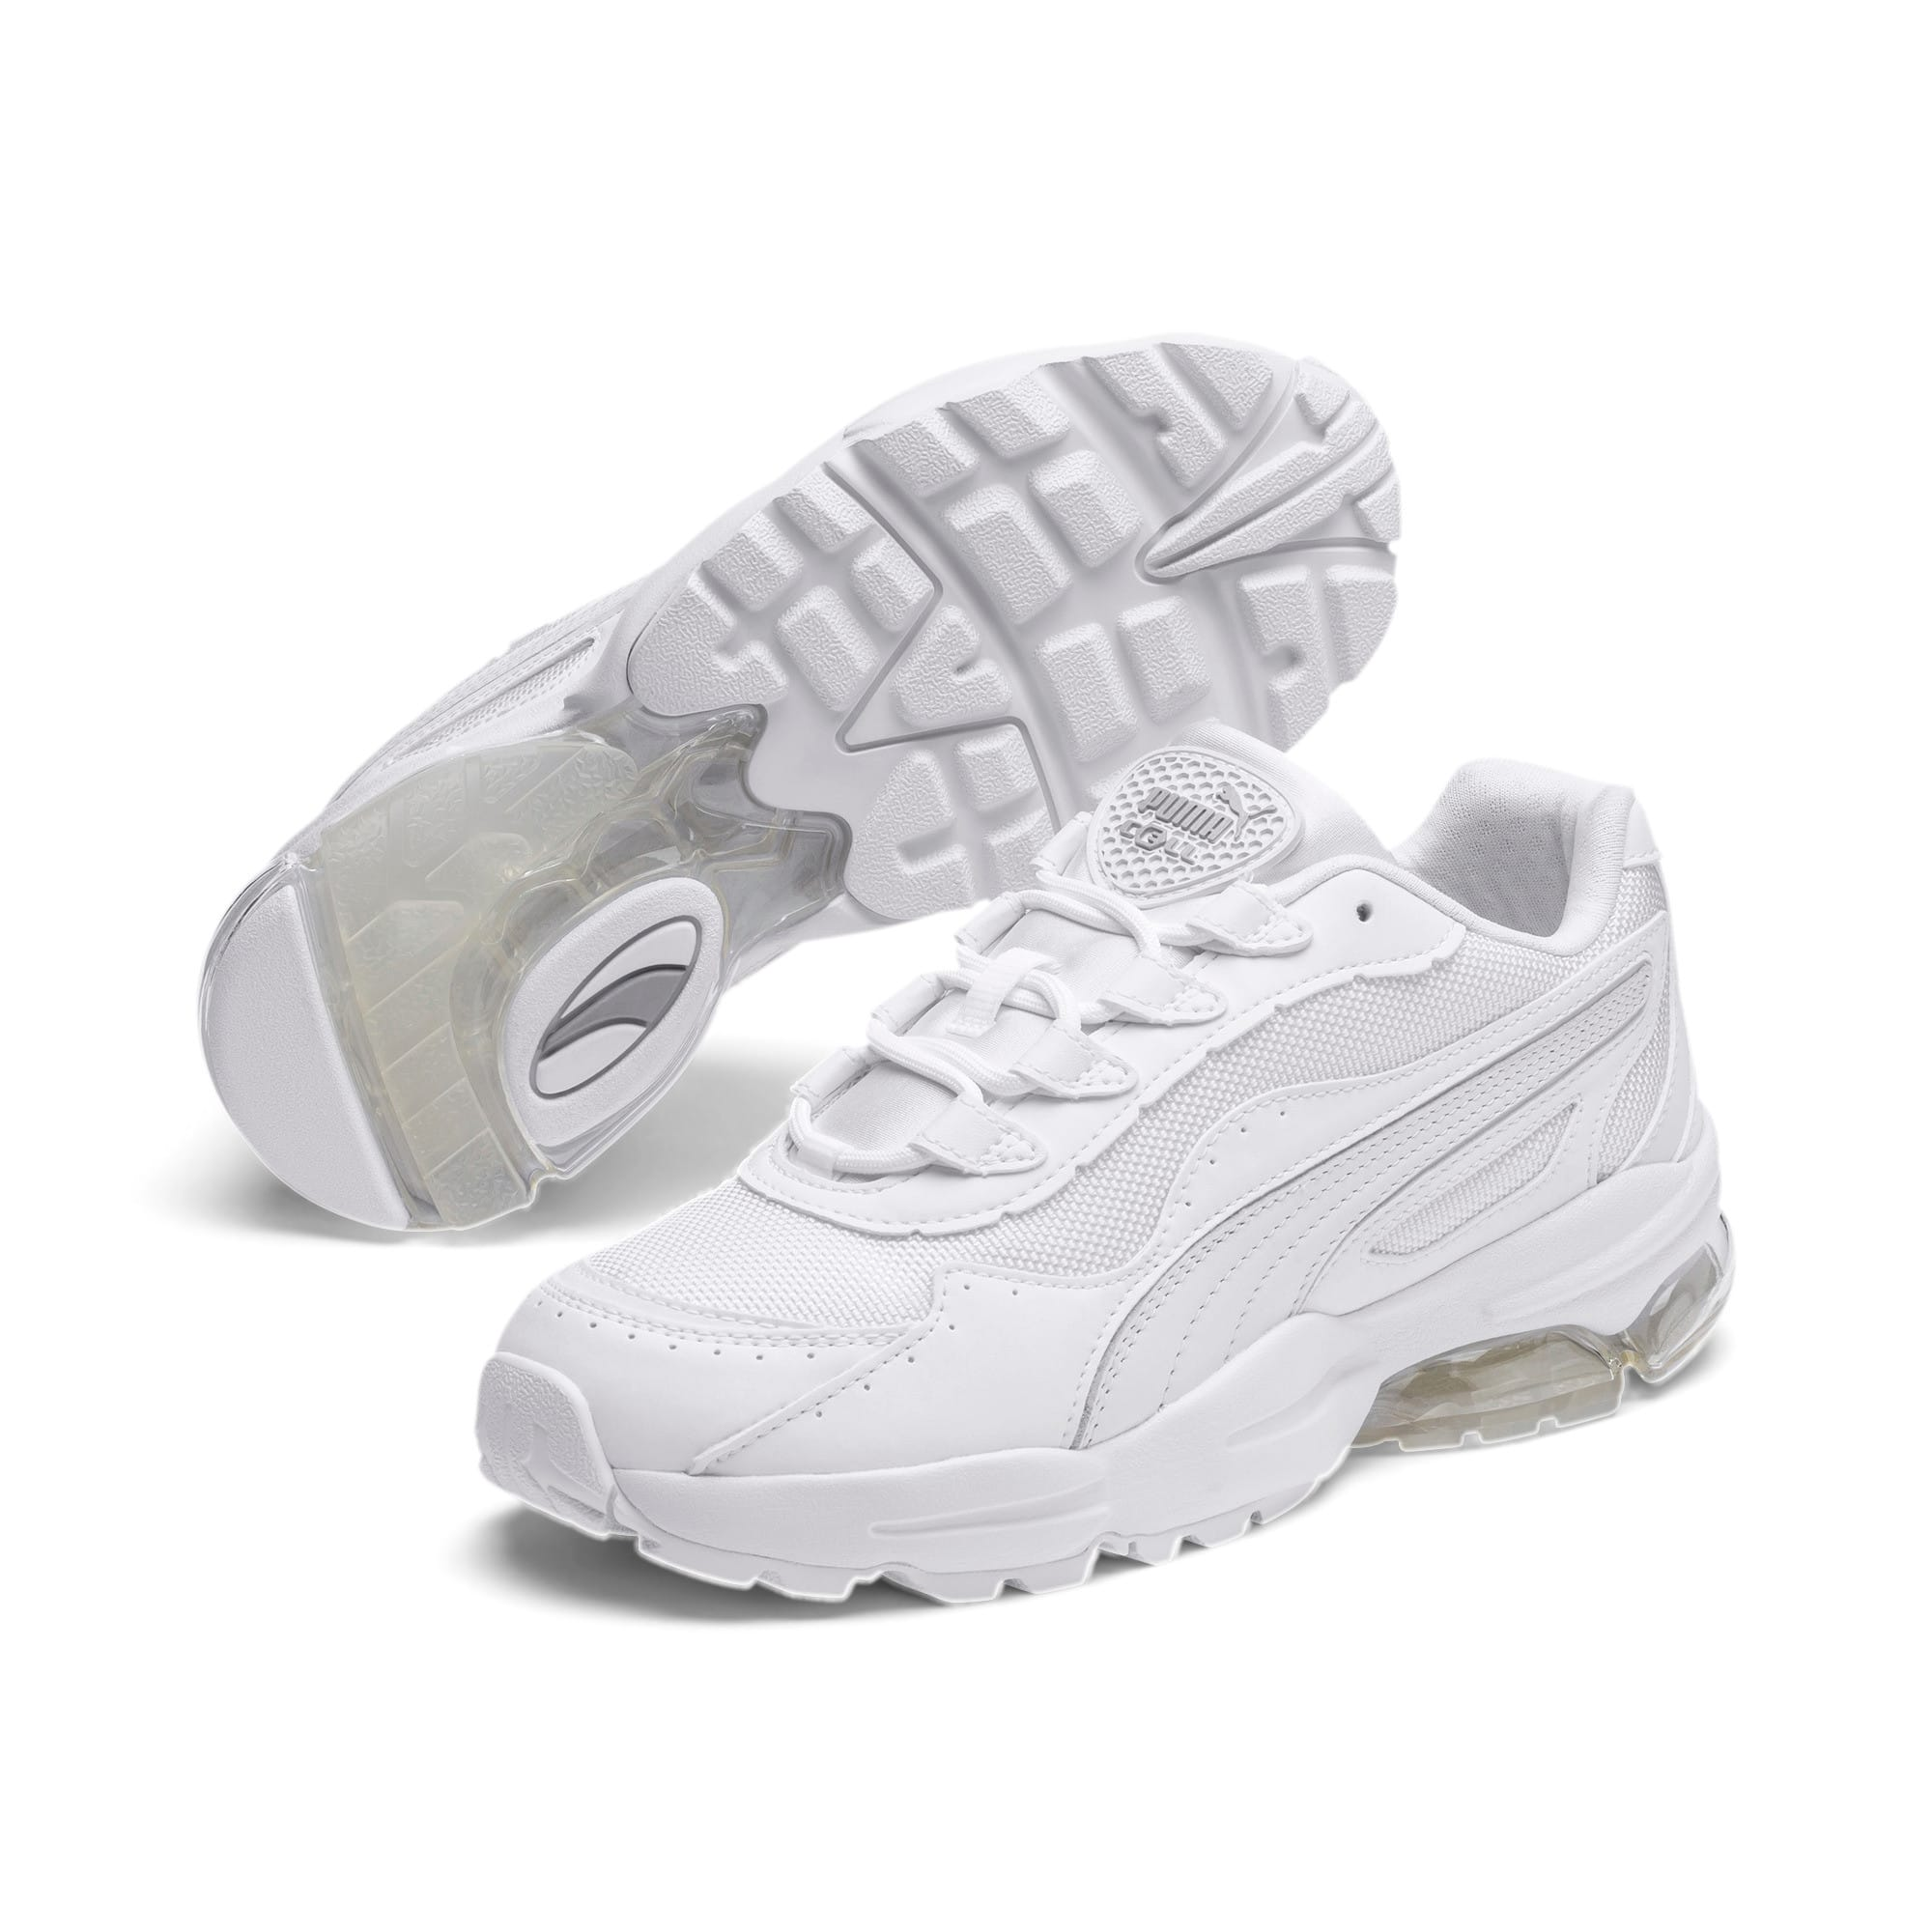 Imagen en miniatura 2 de Zapatillas de mujer CELL Stellar, Puma White-Silver, mediana